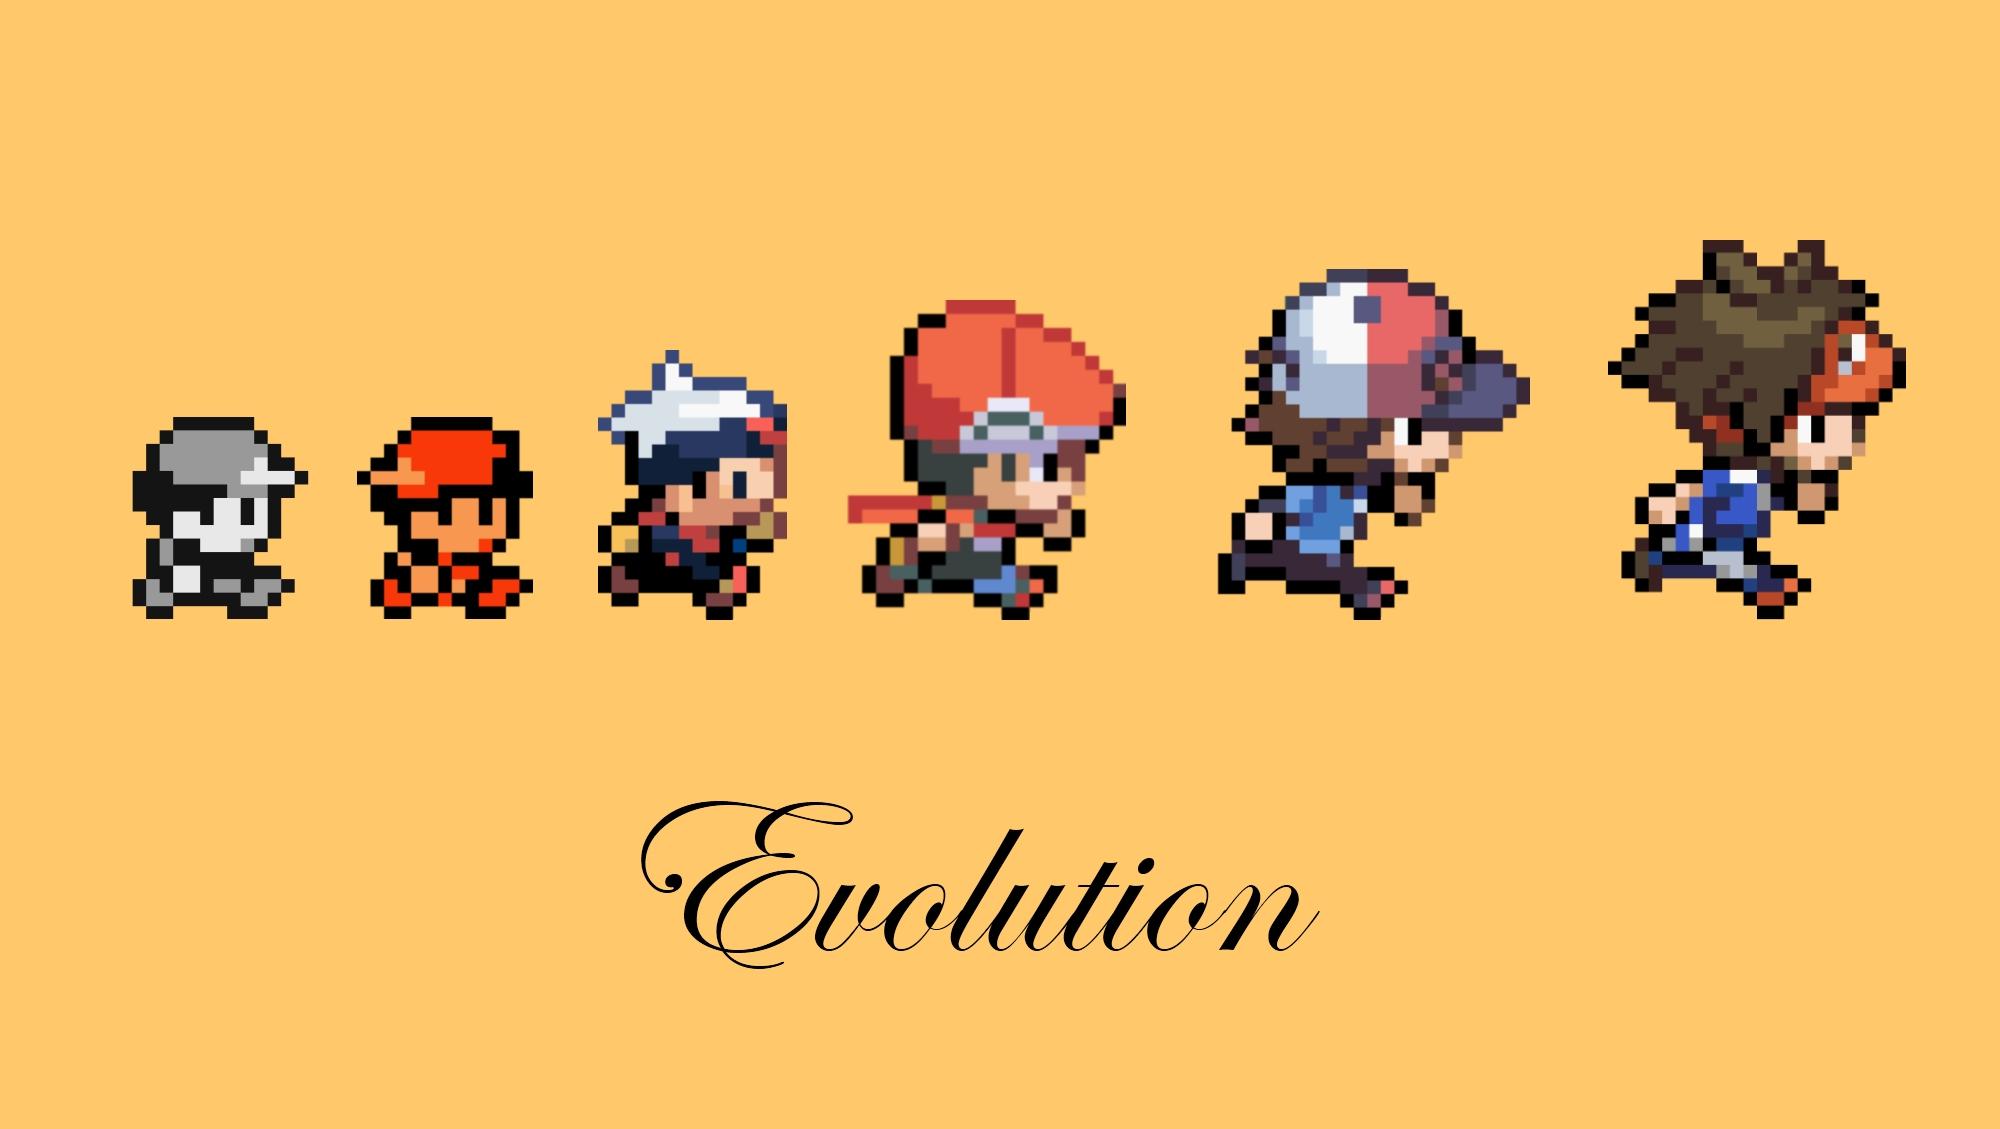 Evolution of pokemon by thedmwarrior on deviantart - X evolution pokemon ...